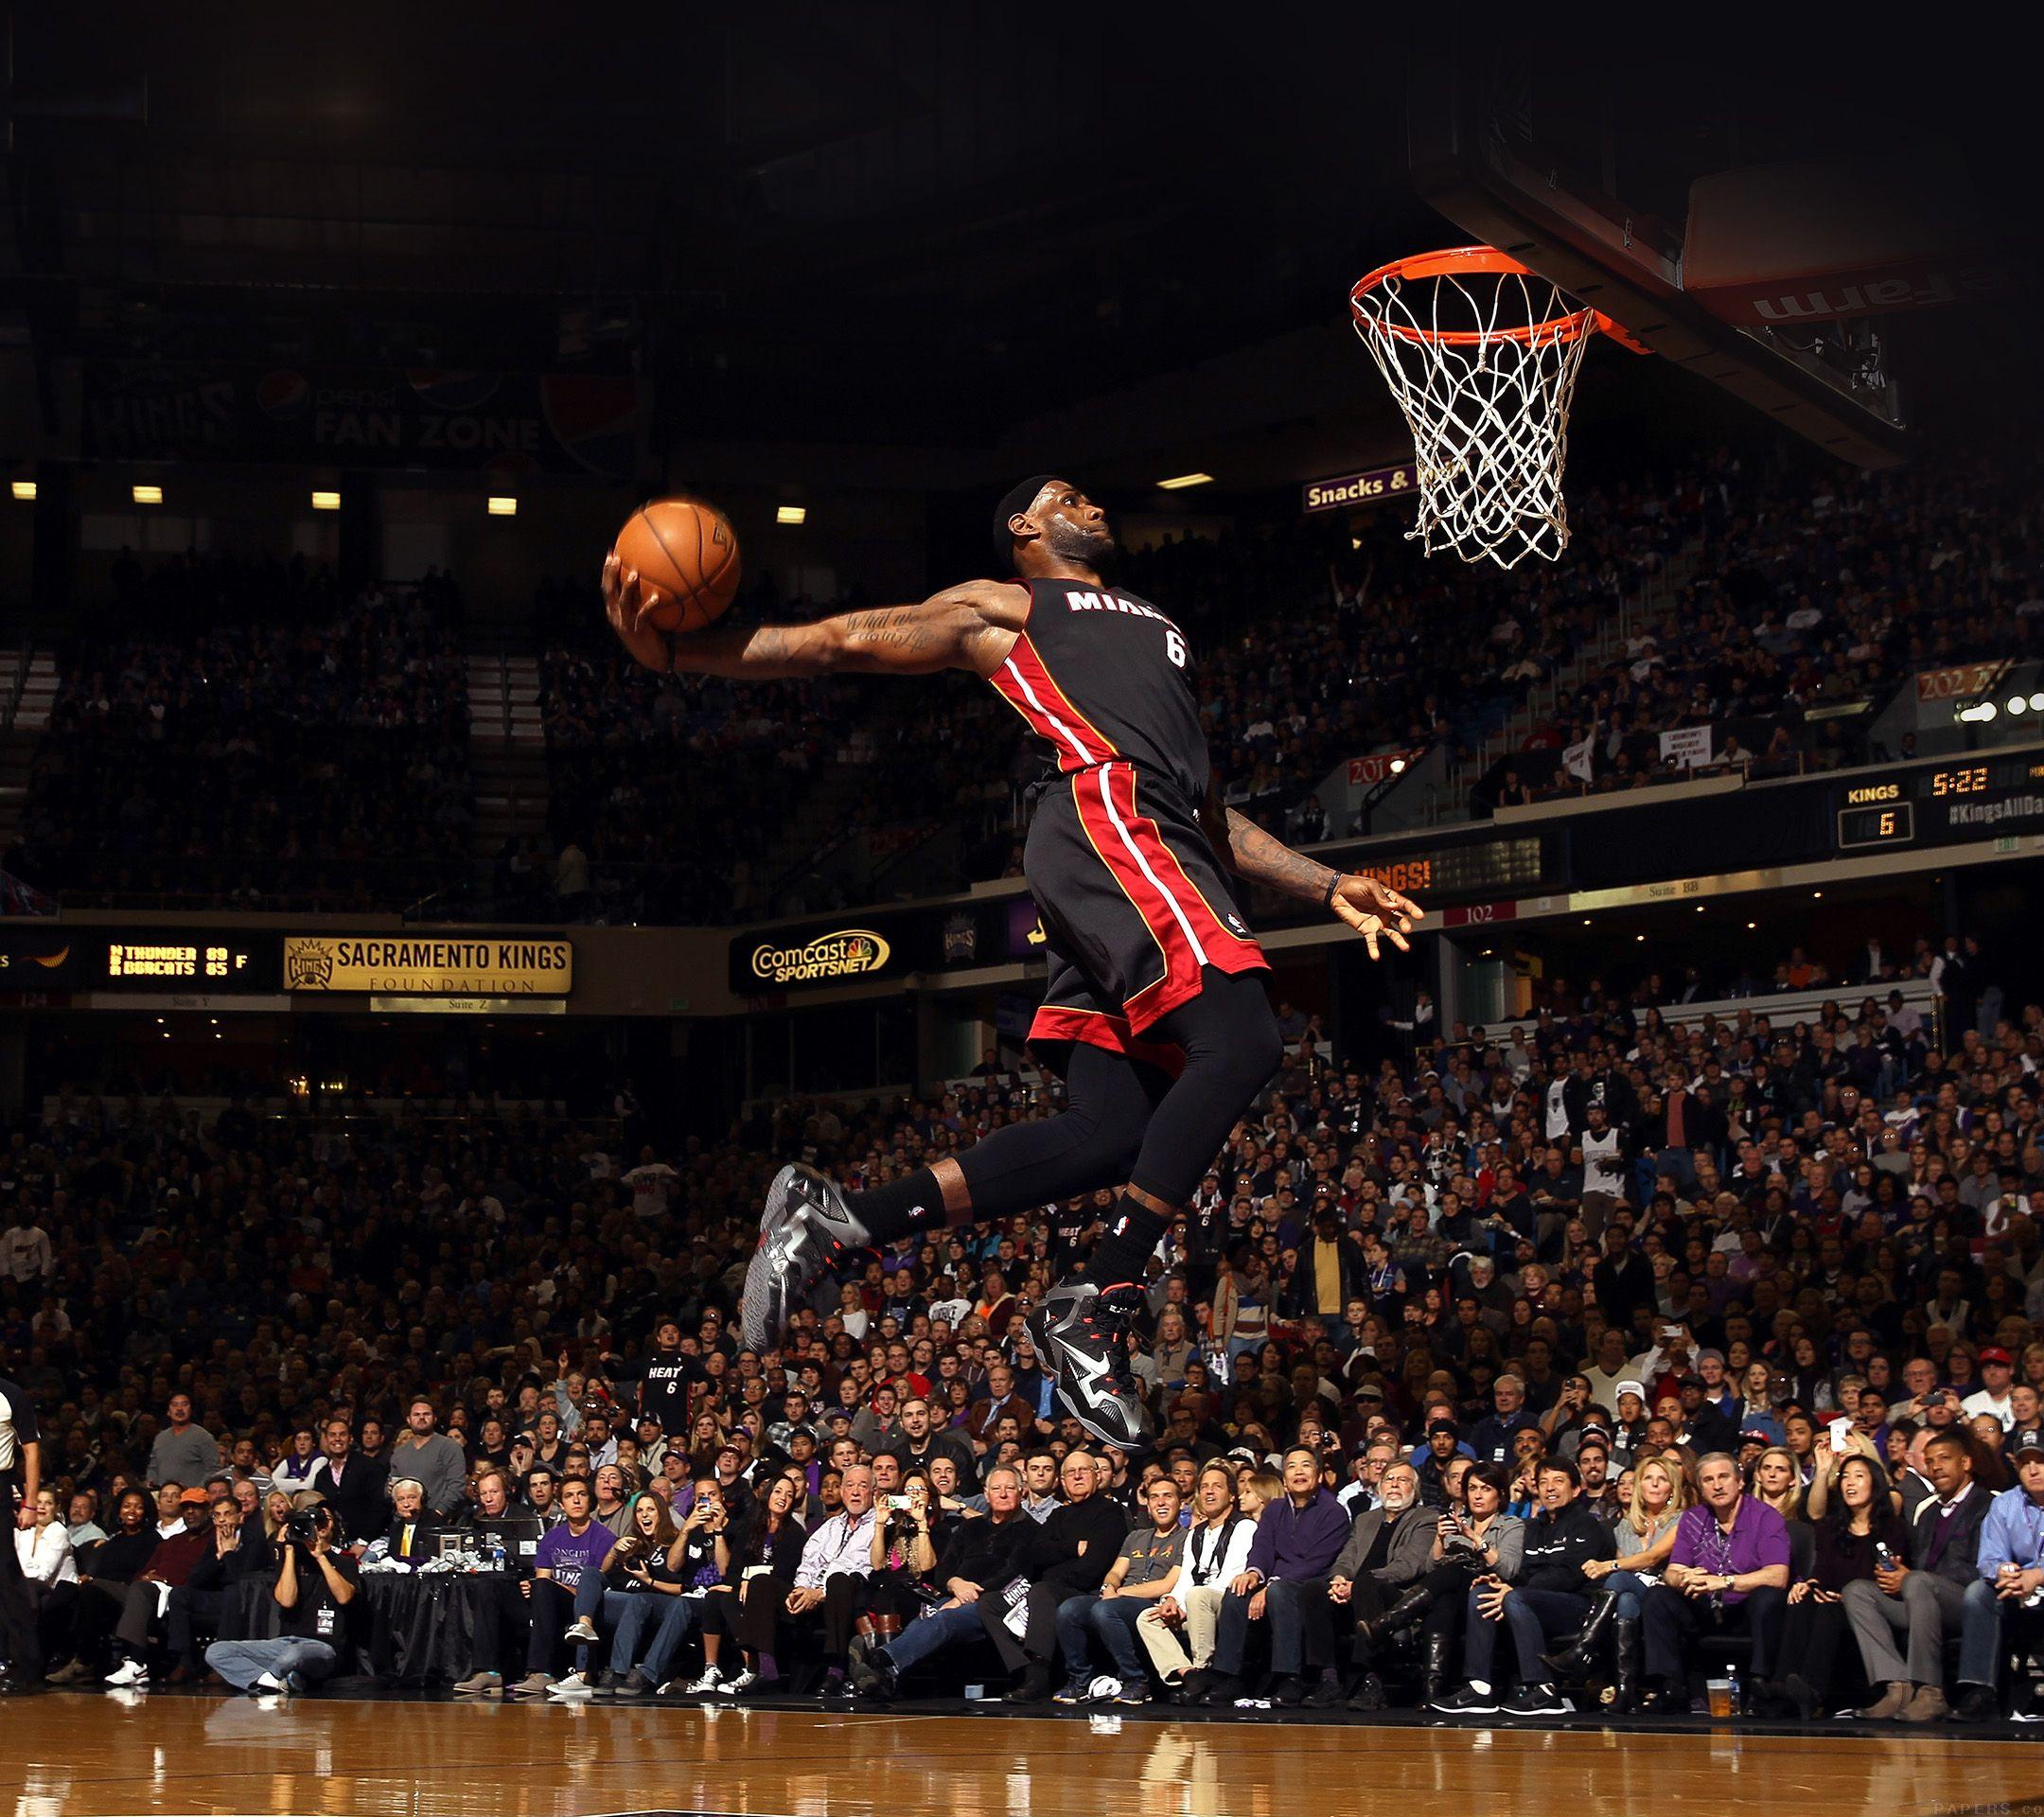 he99-lebron-james-dunk-nba-sports-art-basketball  3967913c764f7